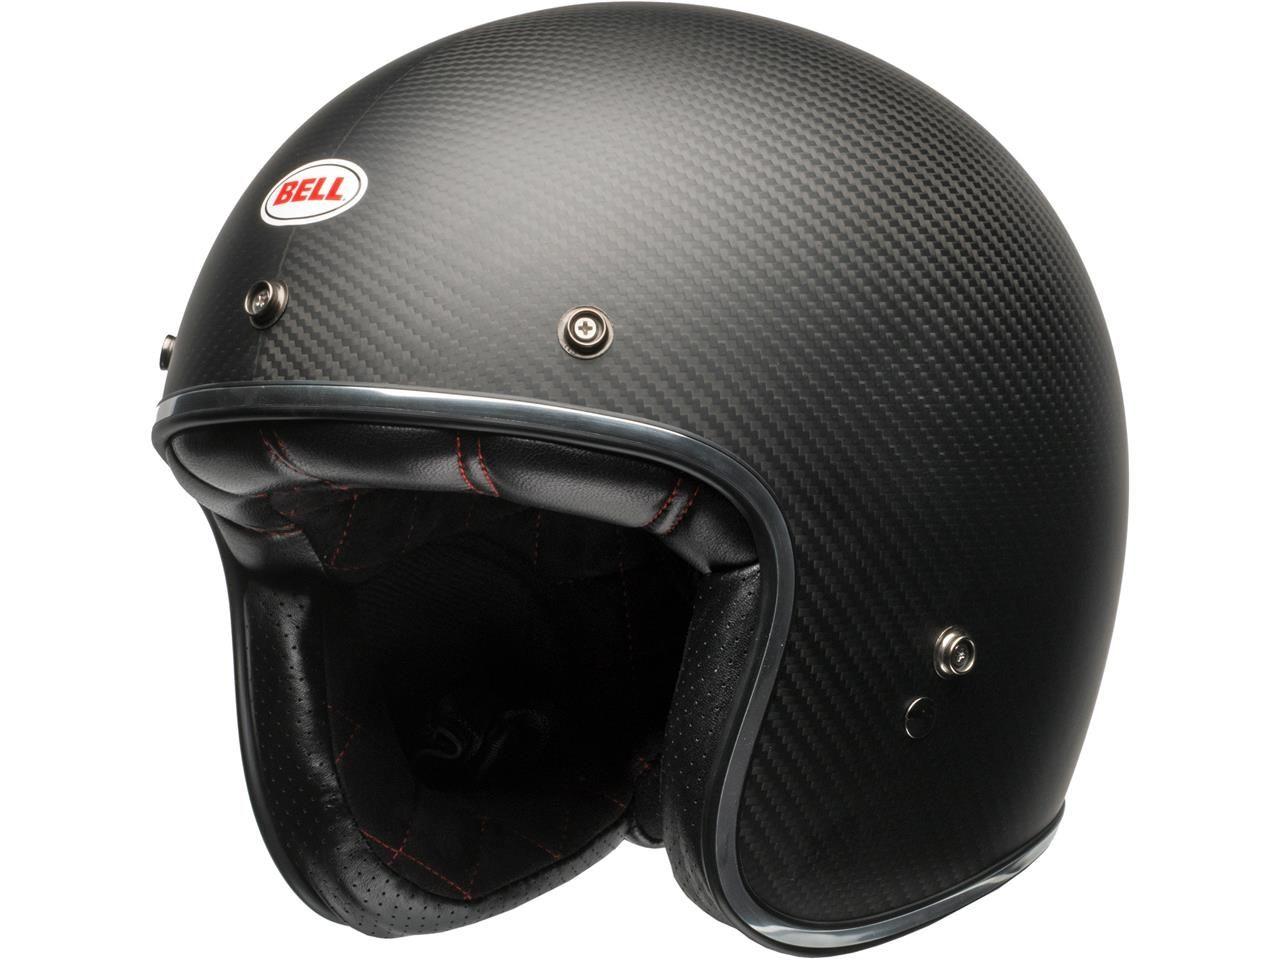 Bell Custom 500 Jethelm Carbon Solid Black